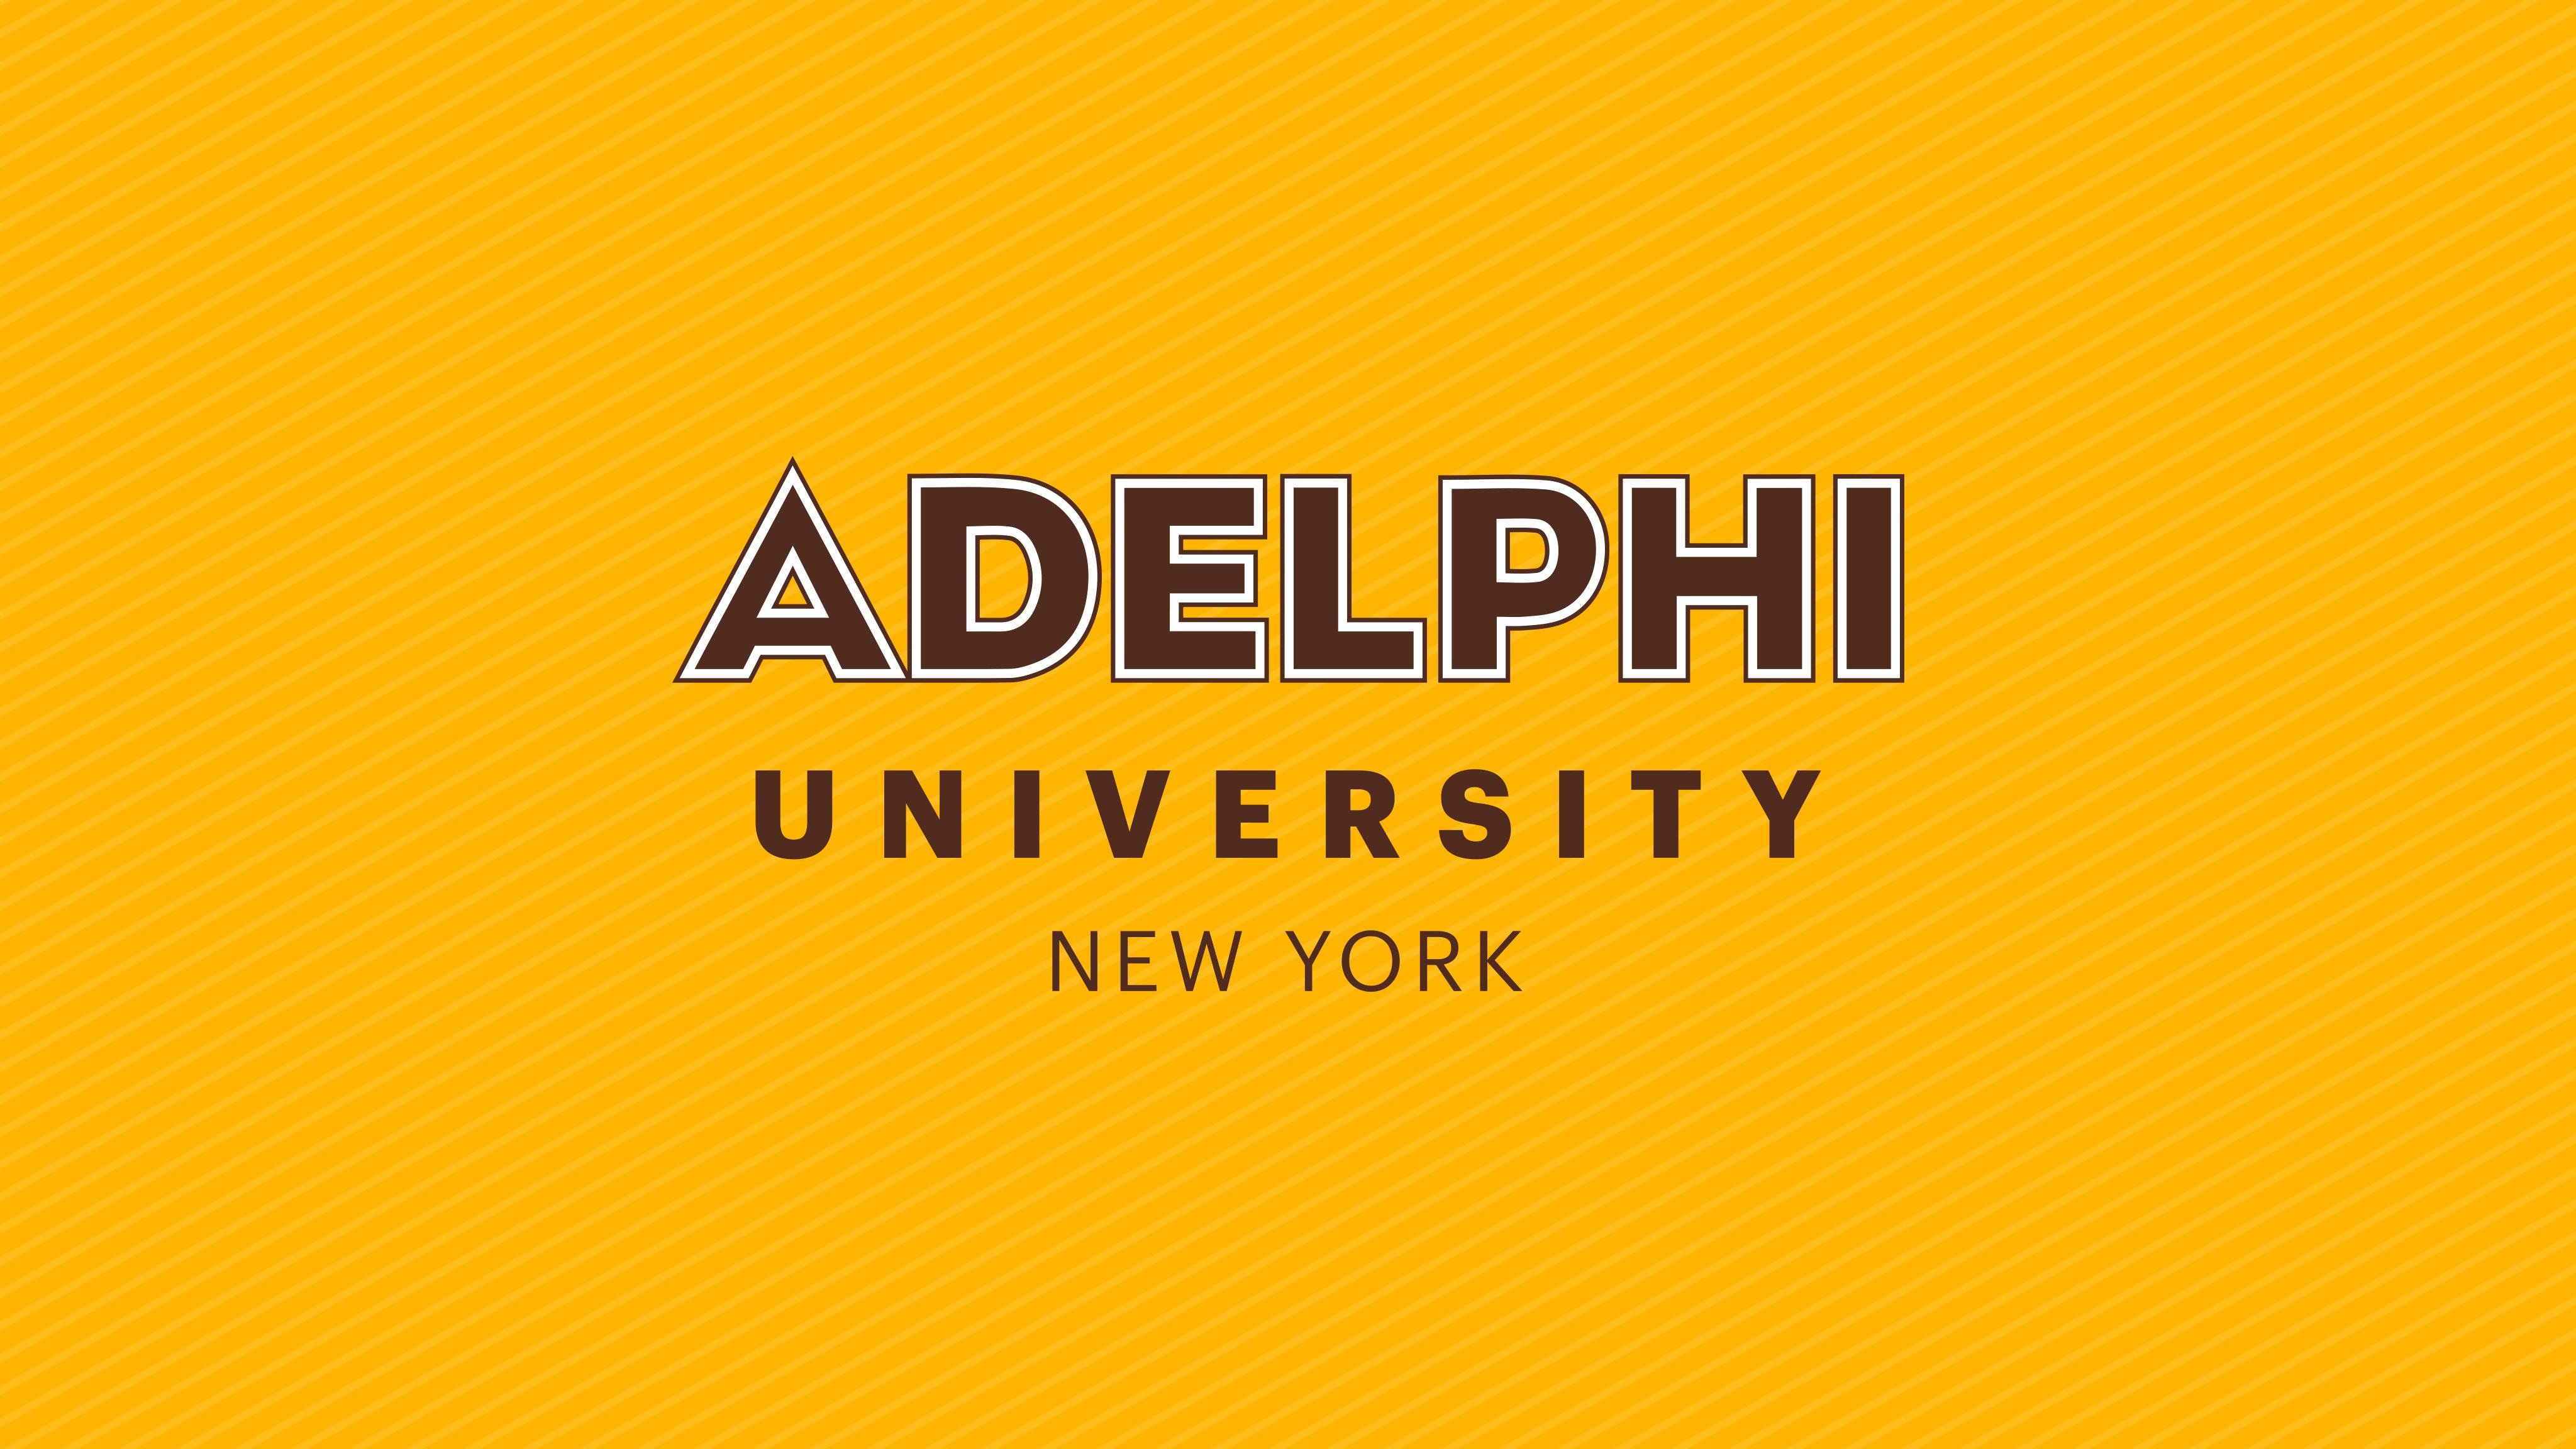 Desktop 16x9 - Adelphi Gold Wallpaper